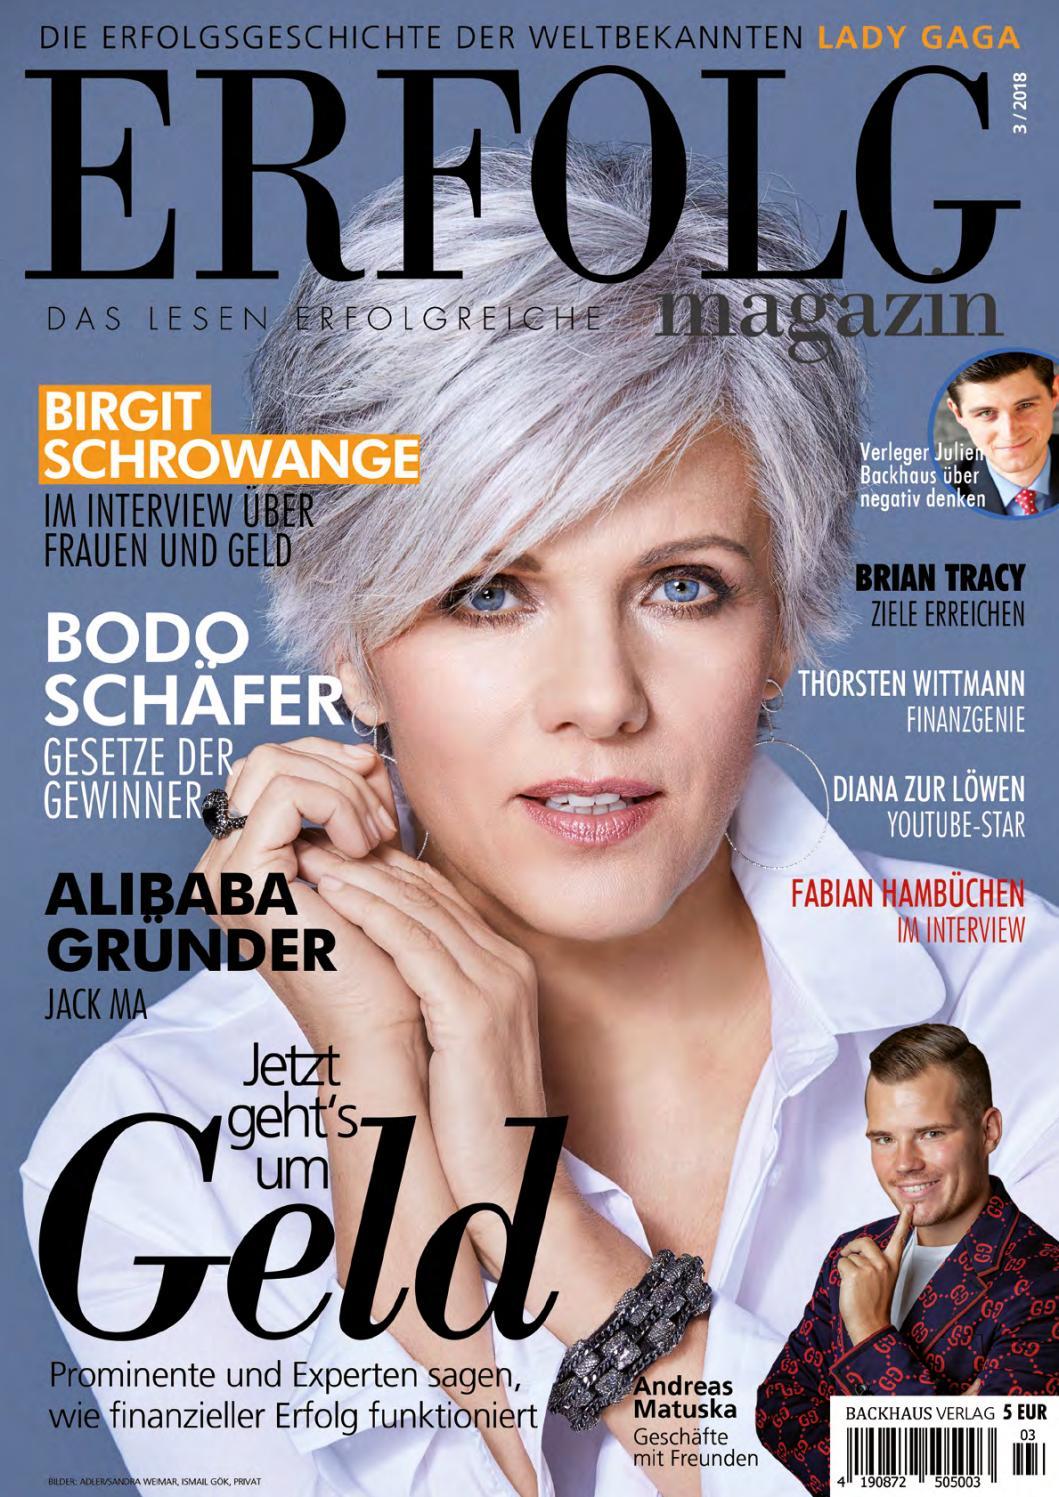 Erfolg Magazin Ausgabe 3-2018 by ERFOLG Magazin - issuu